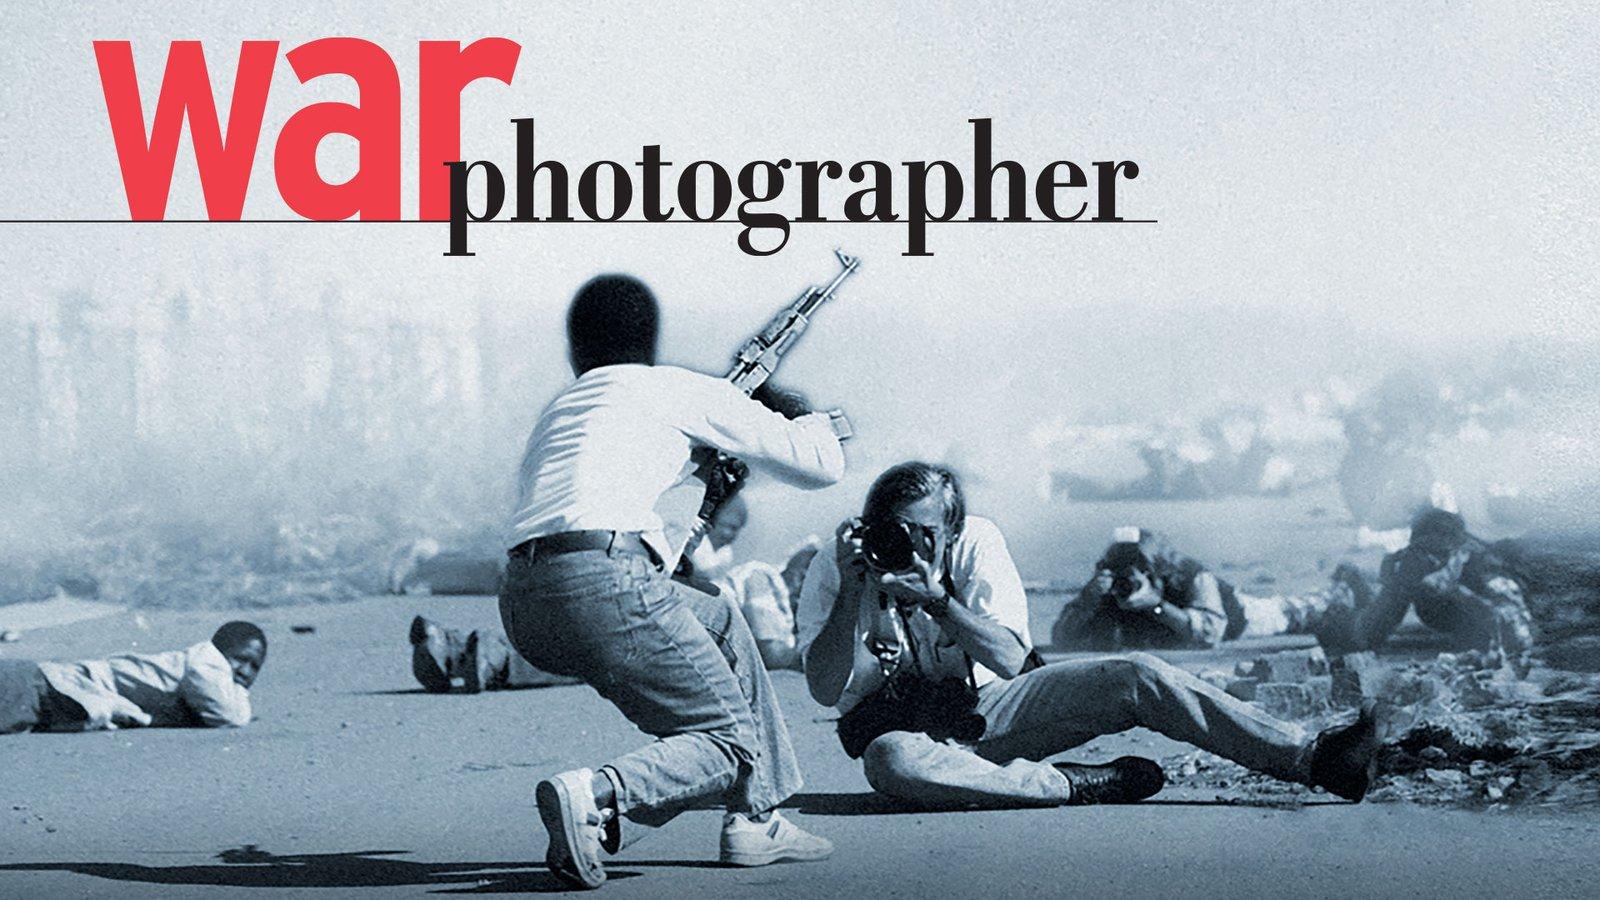 War Photographer - Photojournalist James Nachtwey